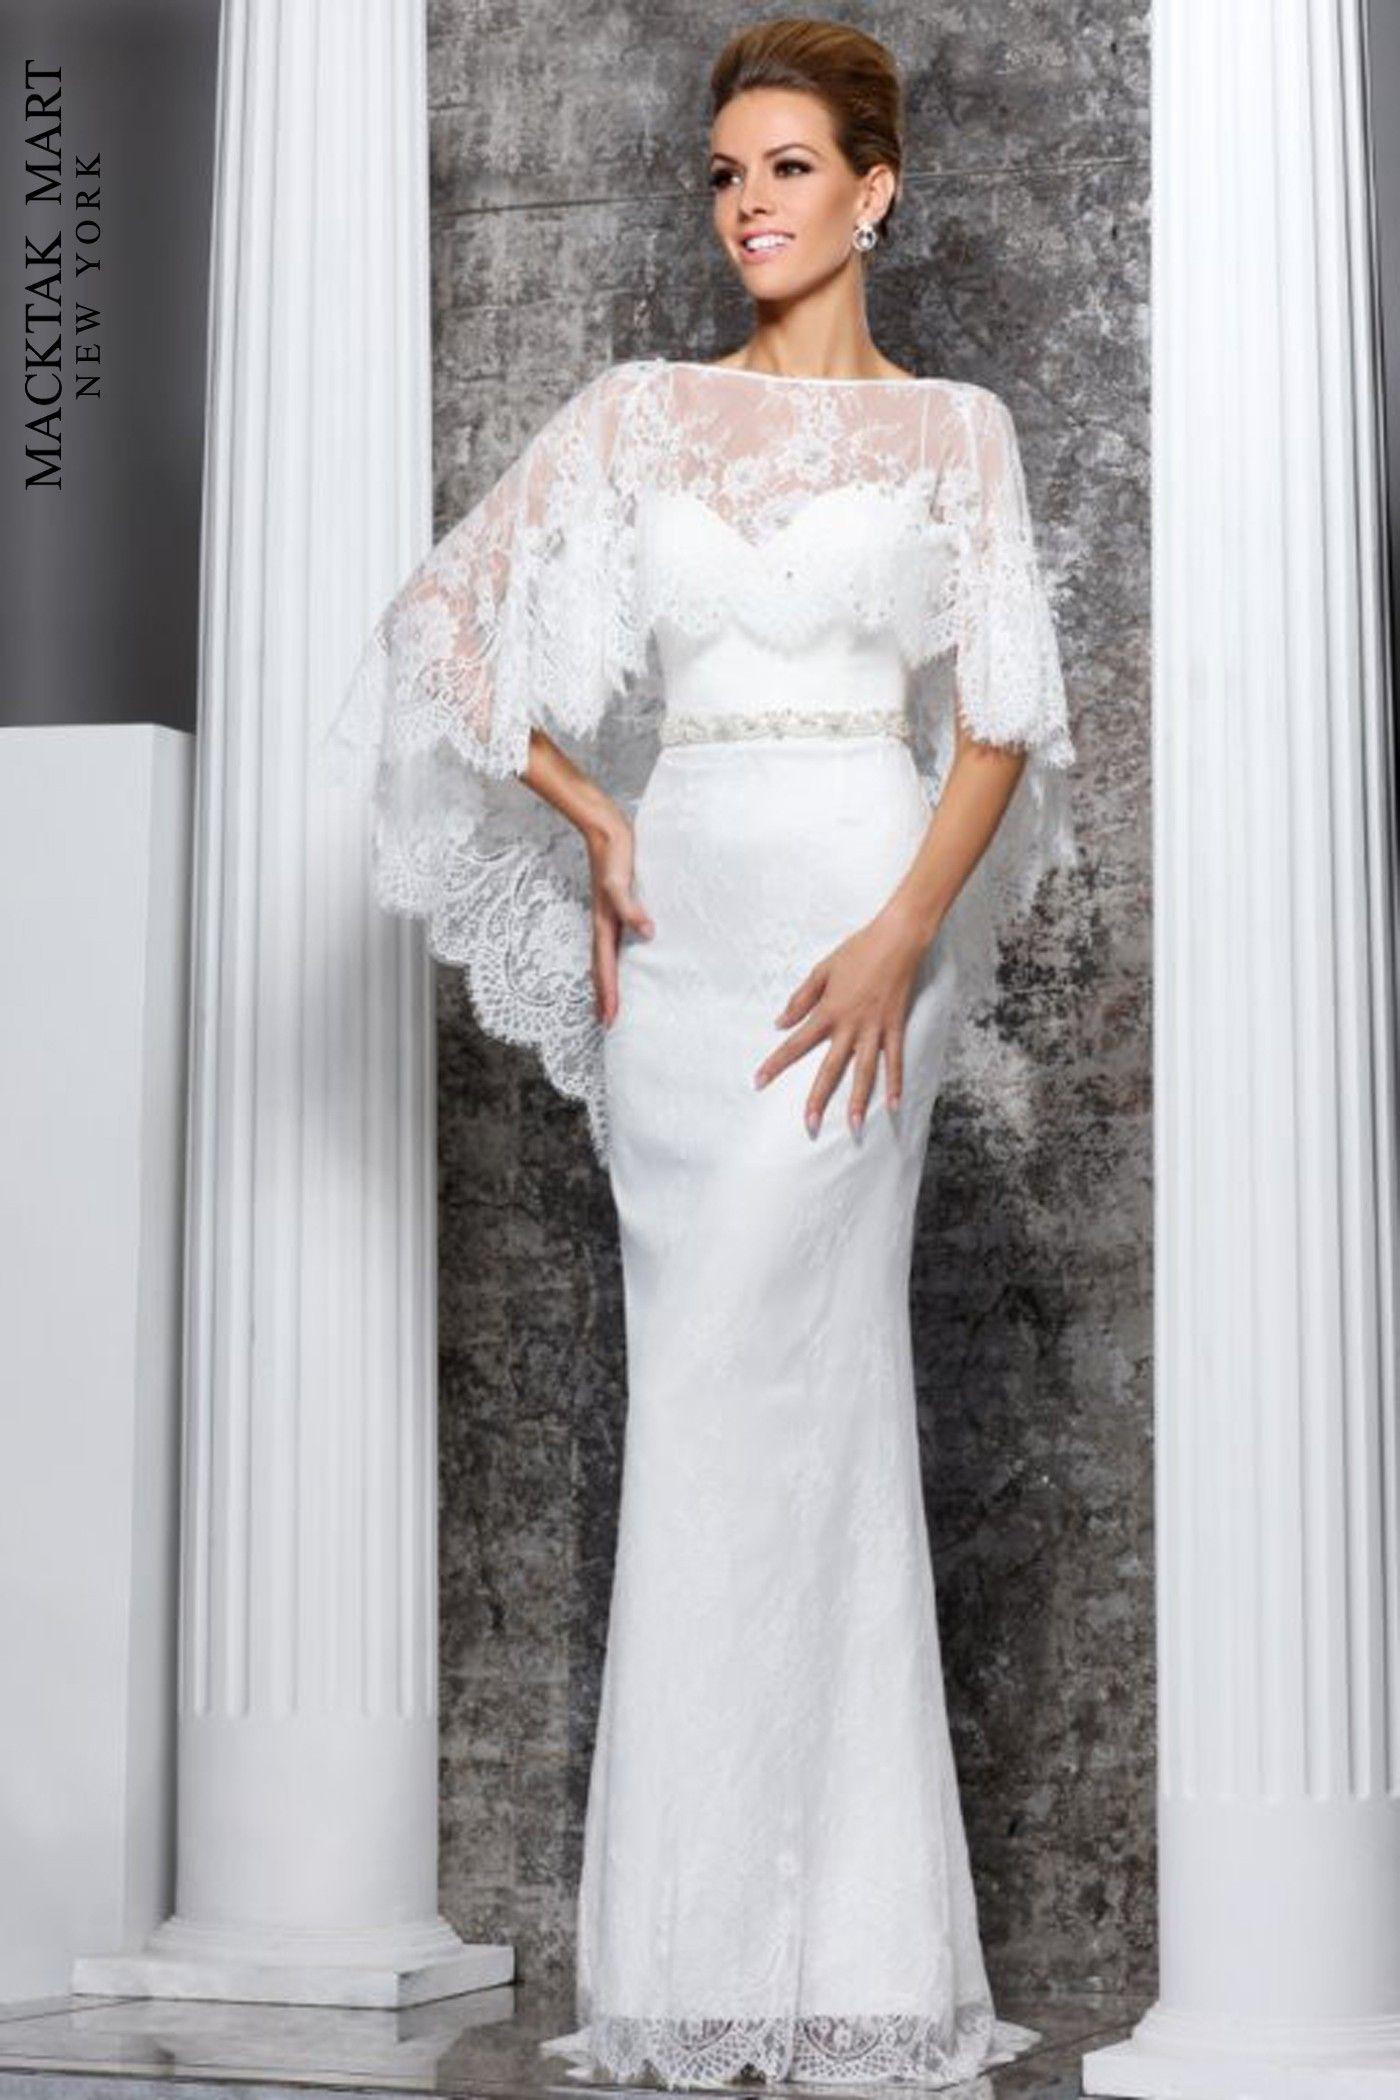 NYC Wedding Dress Sale Clearance